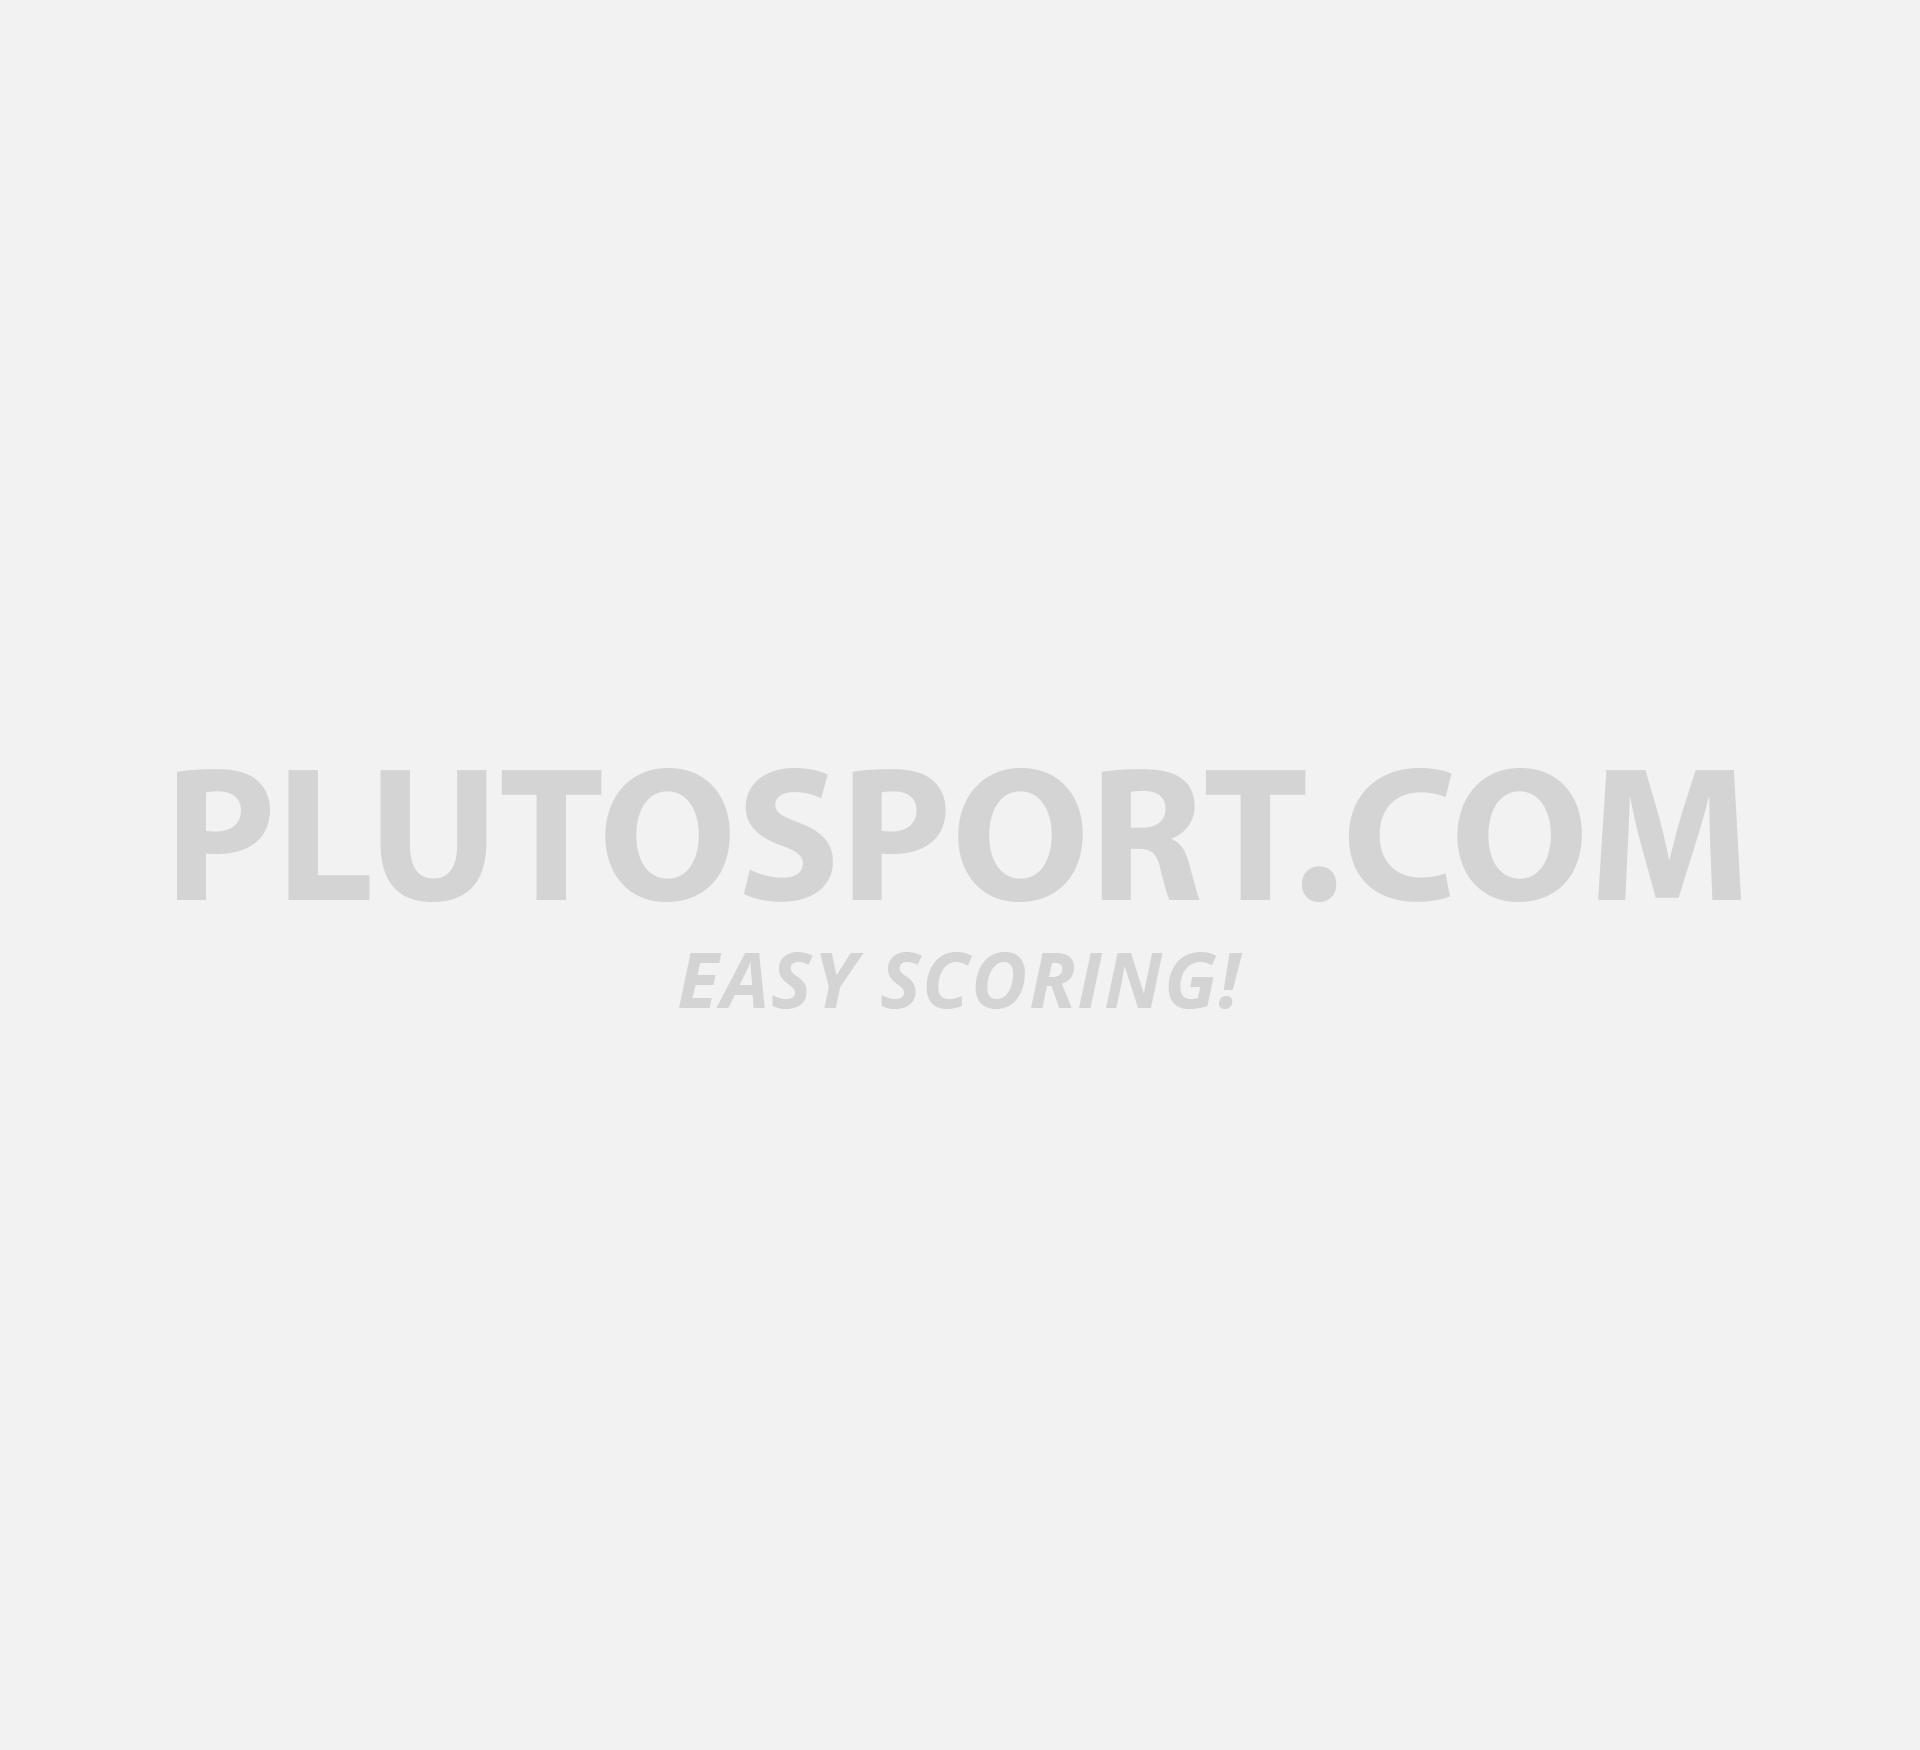 Nike Swoosh Skinny Sport Headbands (8-pack)